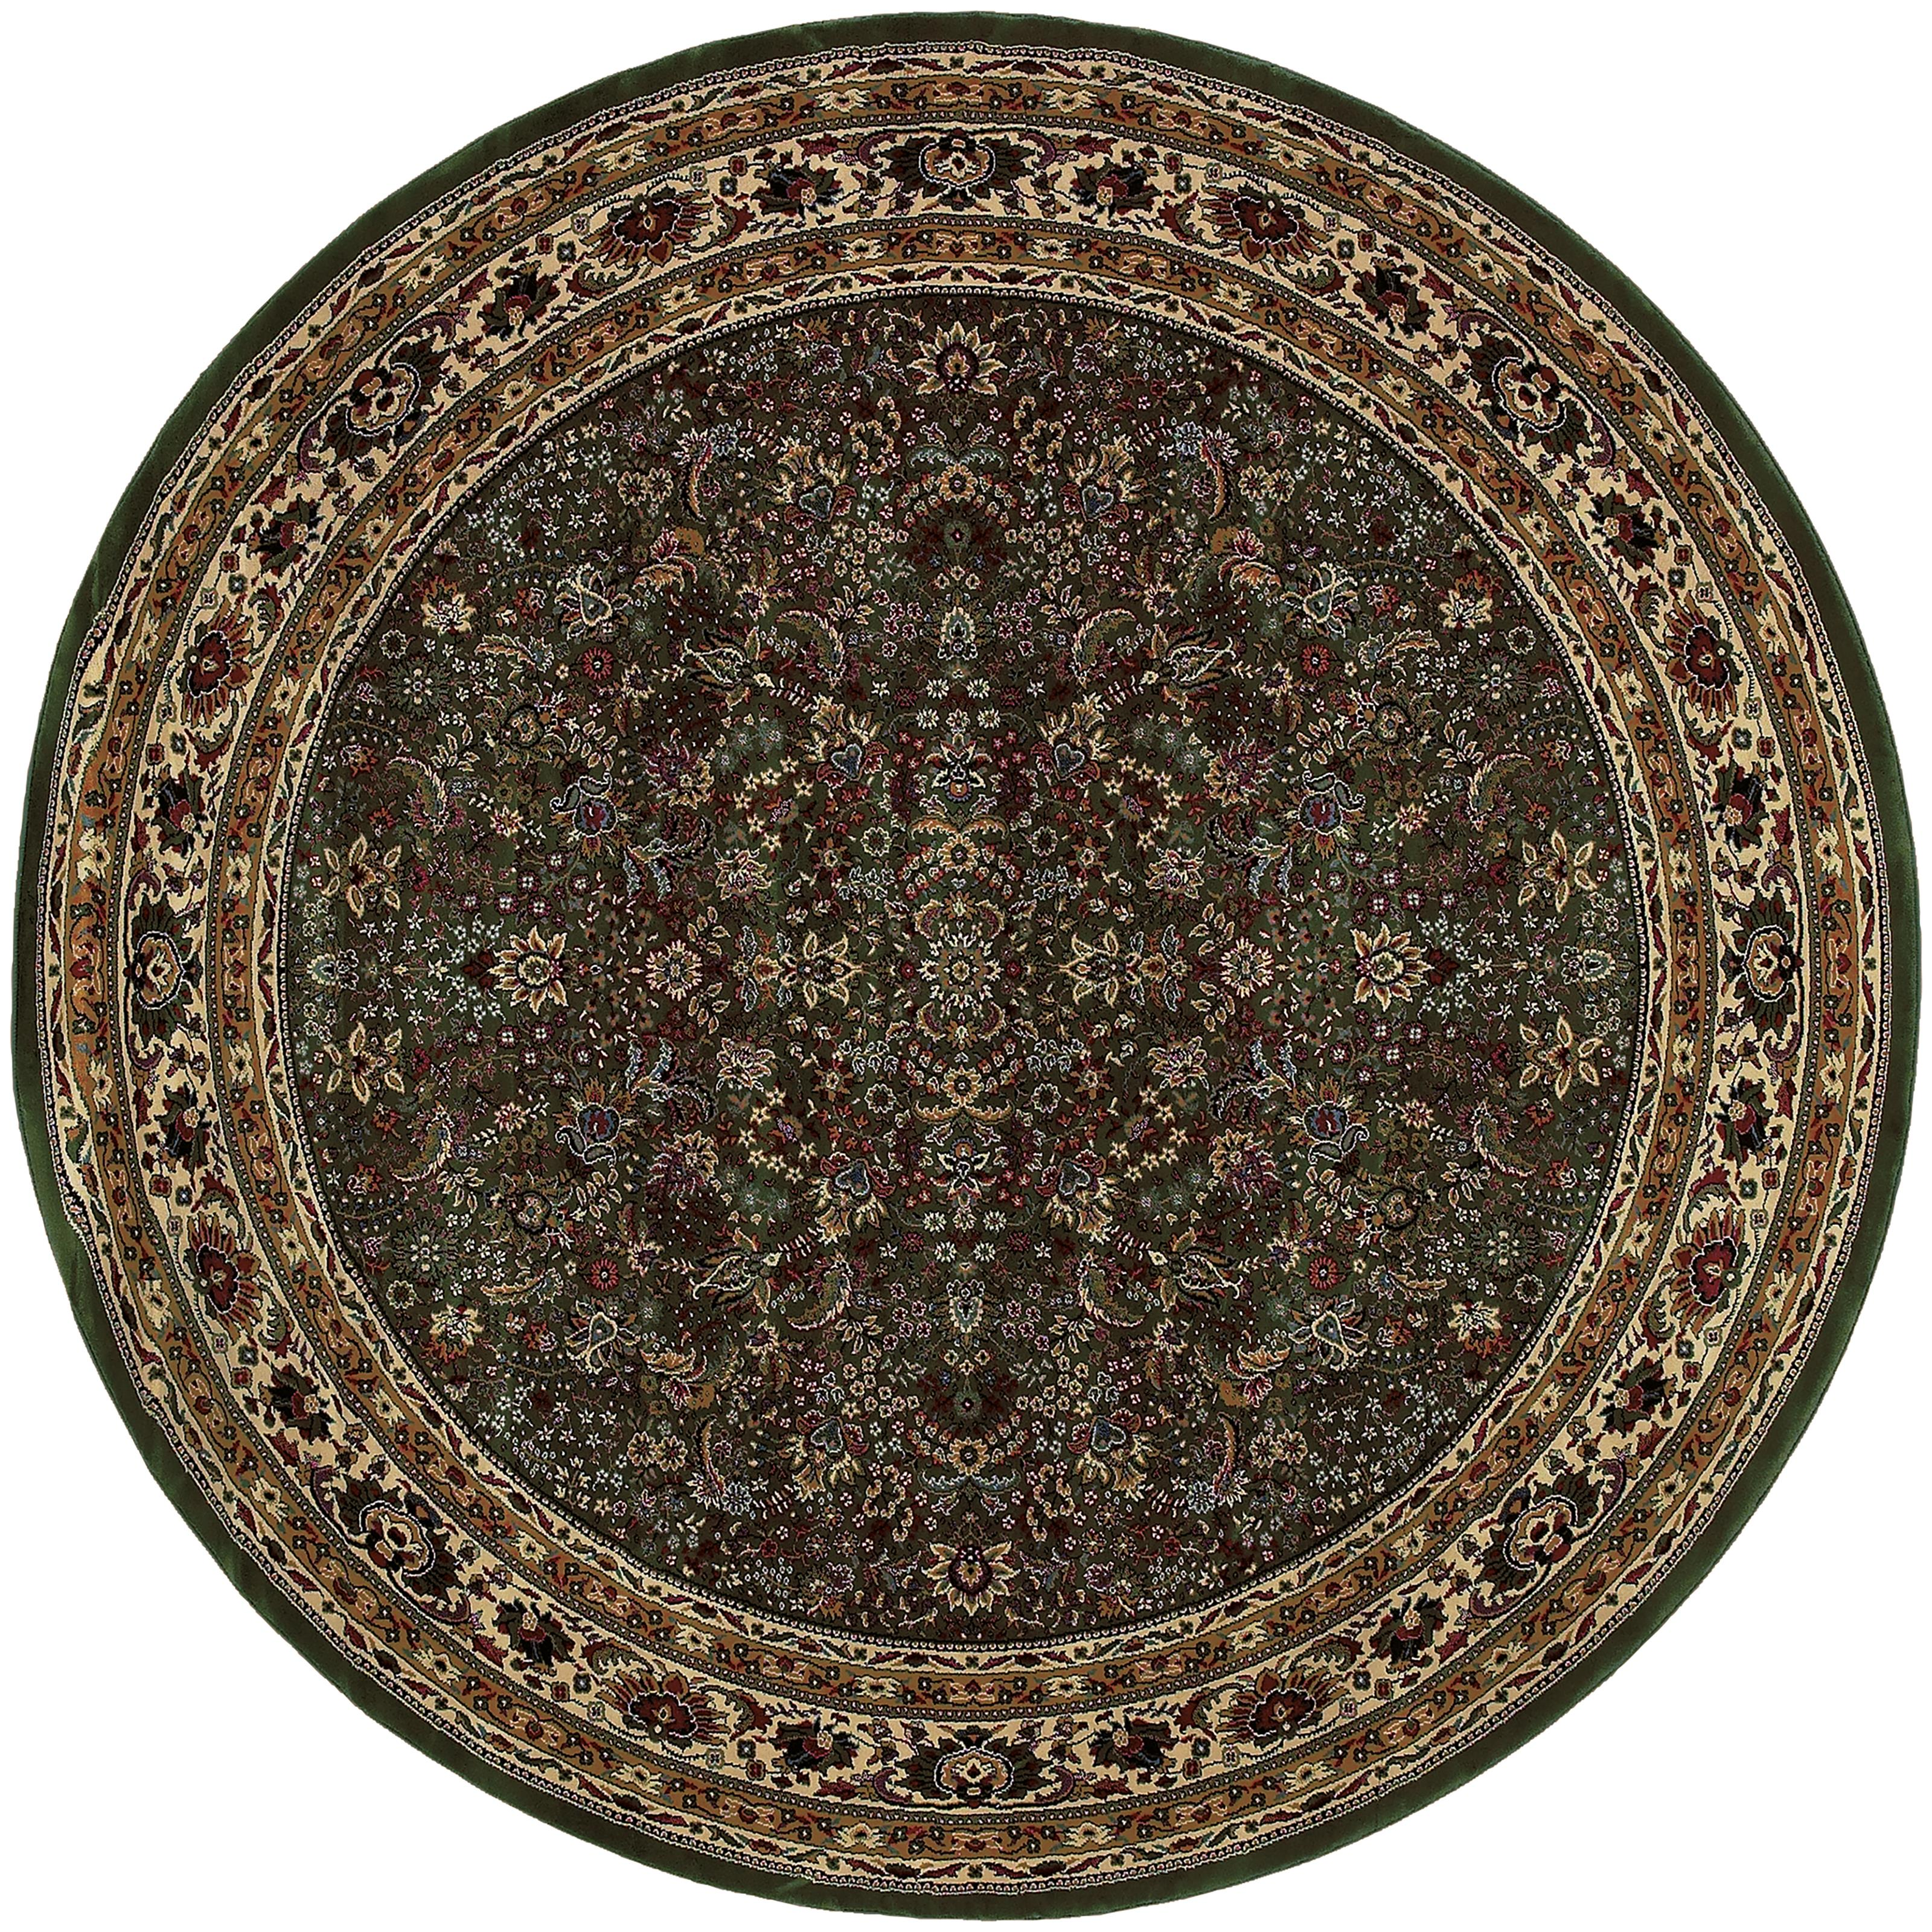 Oriental Weavers Ariana 8' Rug - Item Number: A213G8240240ST